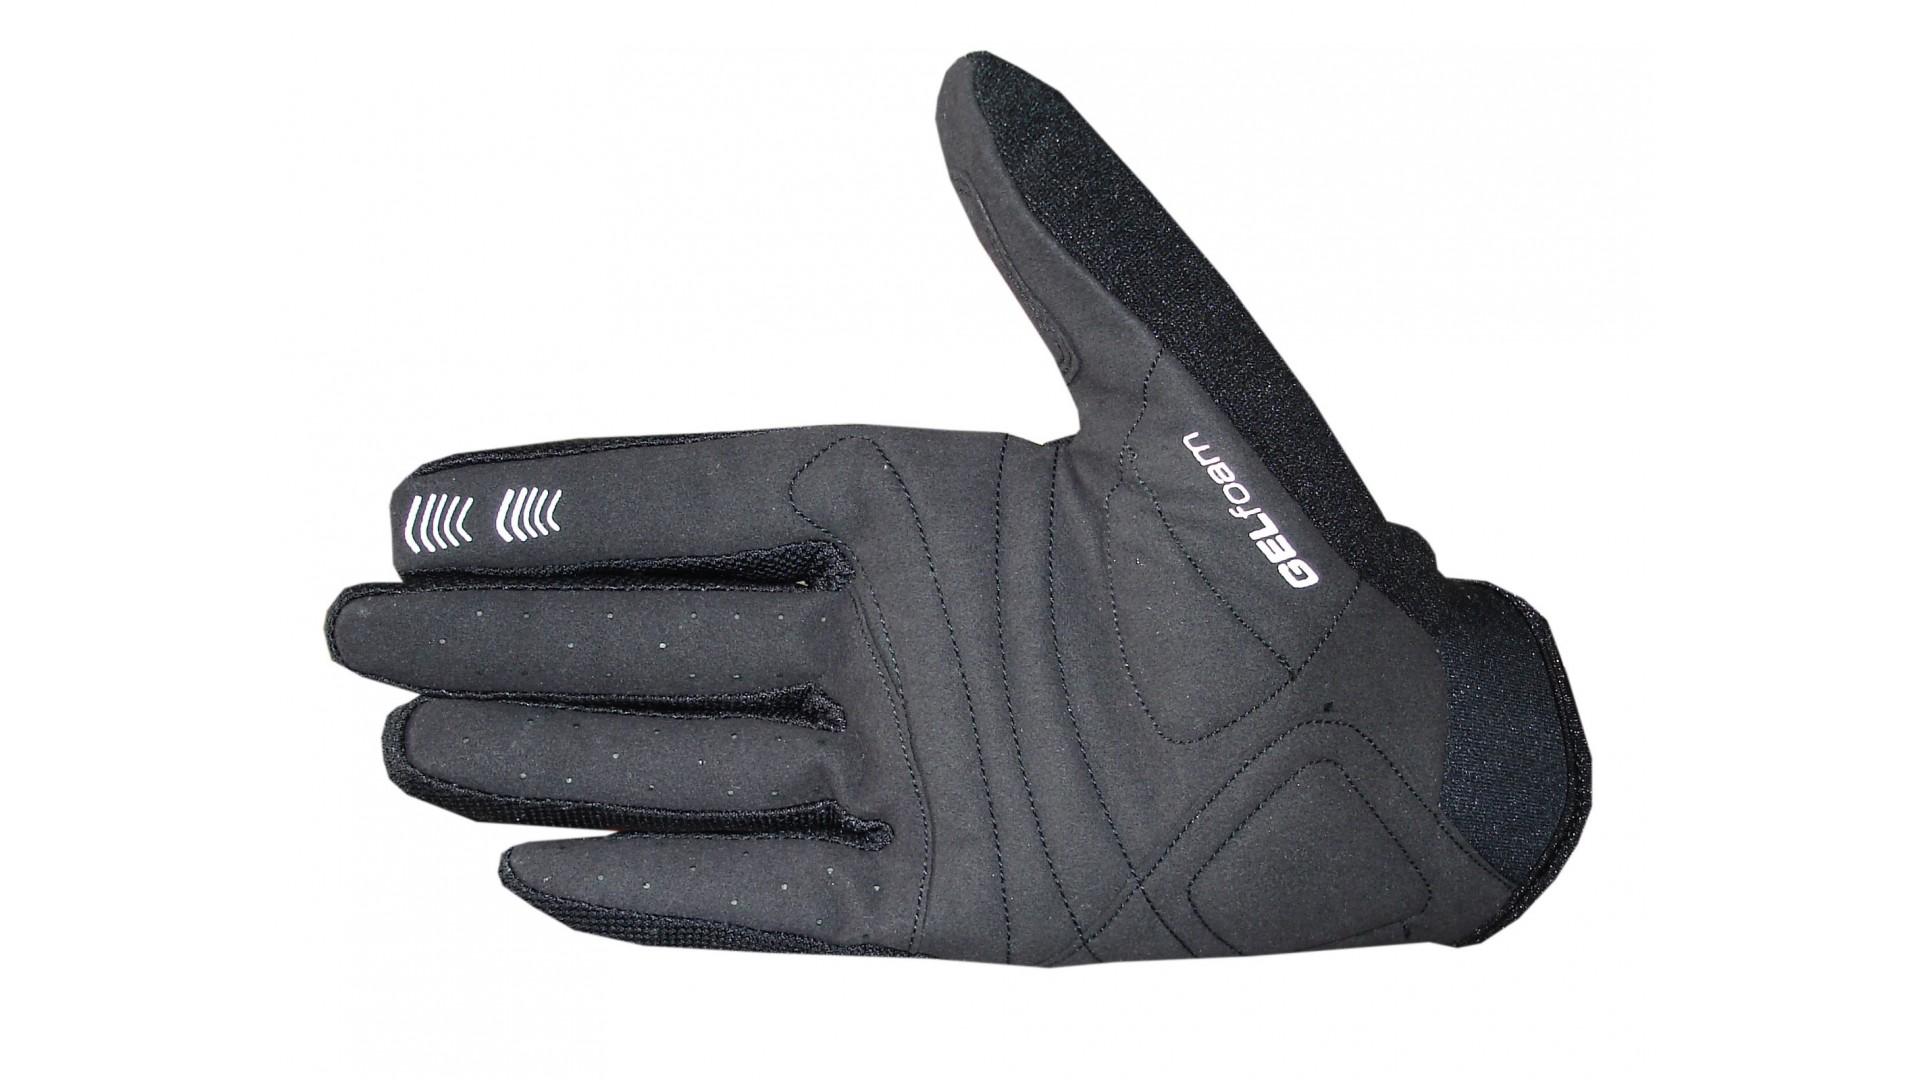 Велоперчатки Ghost c длинными пальцами black/green/white год 2014